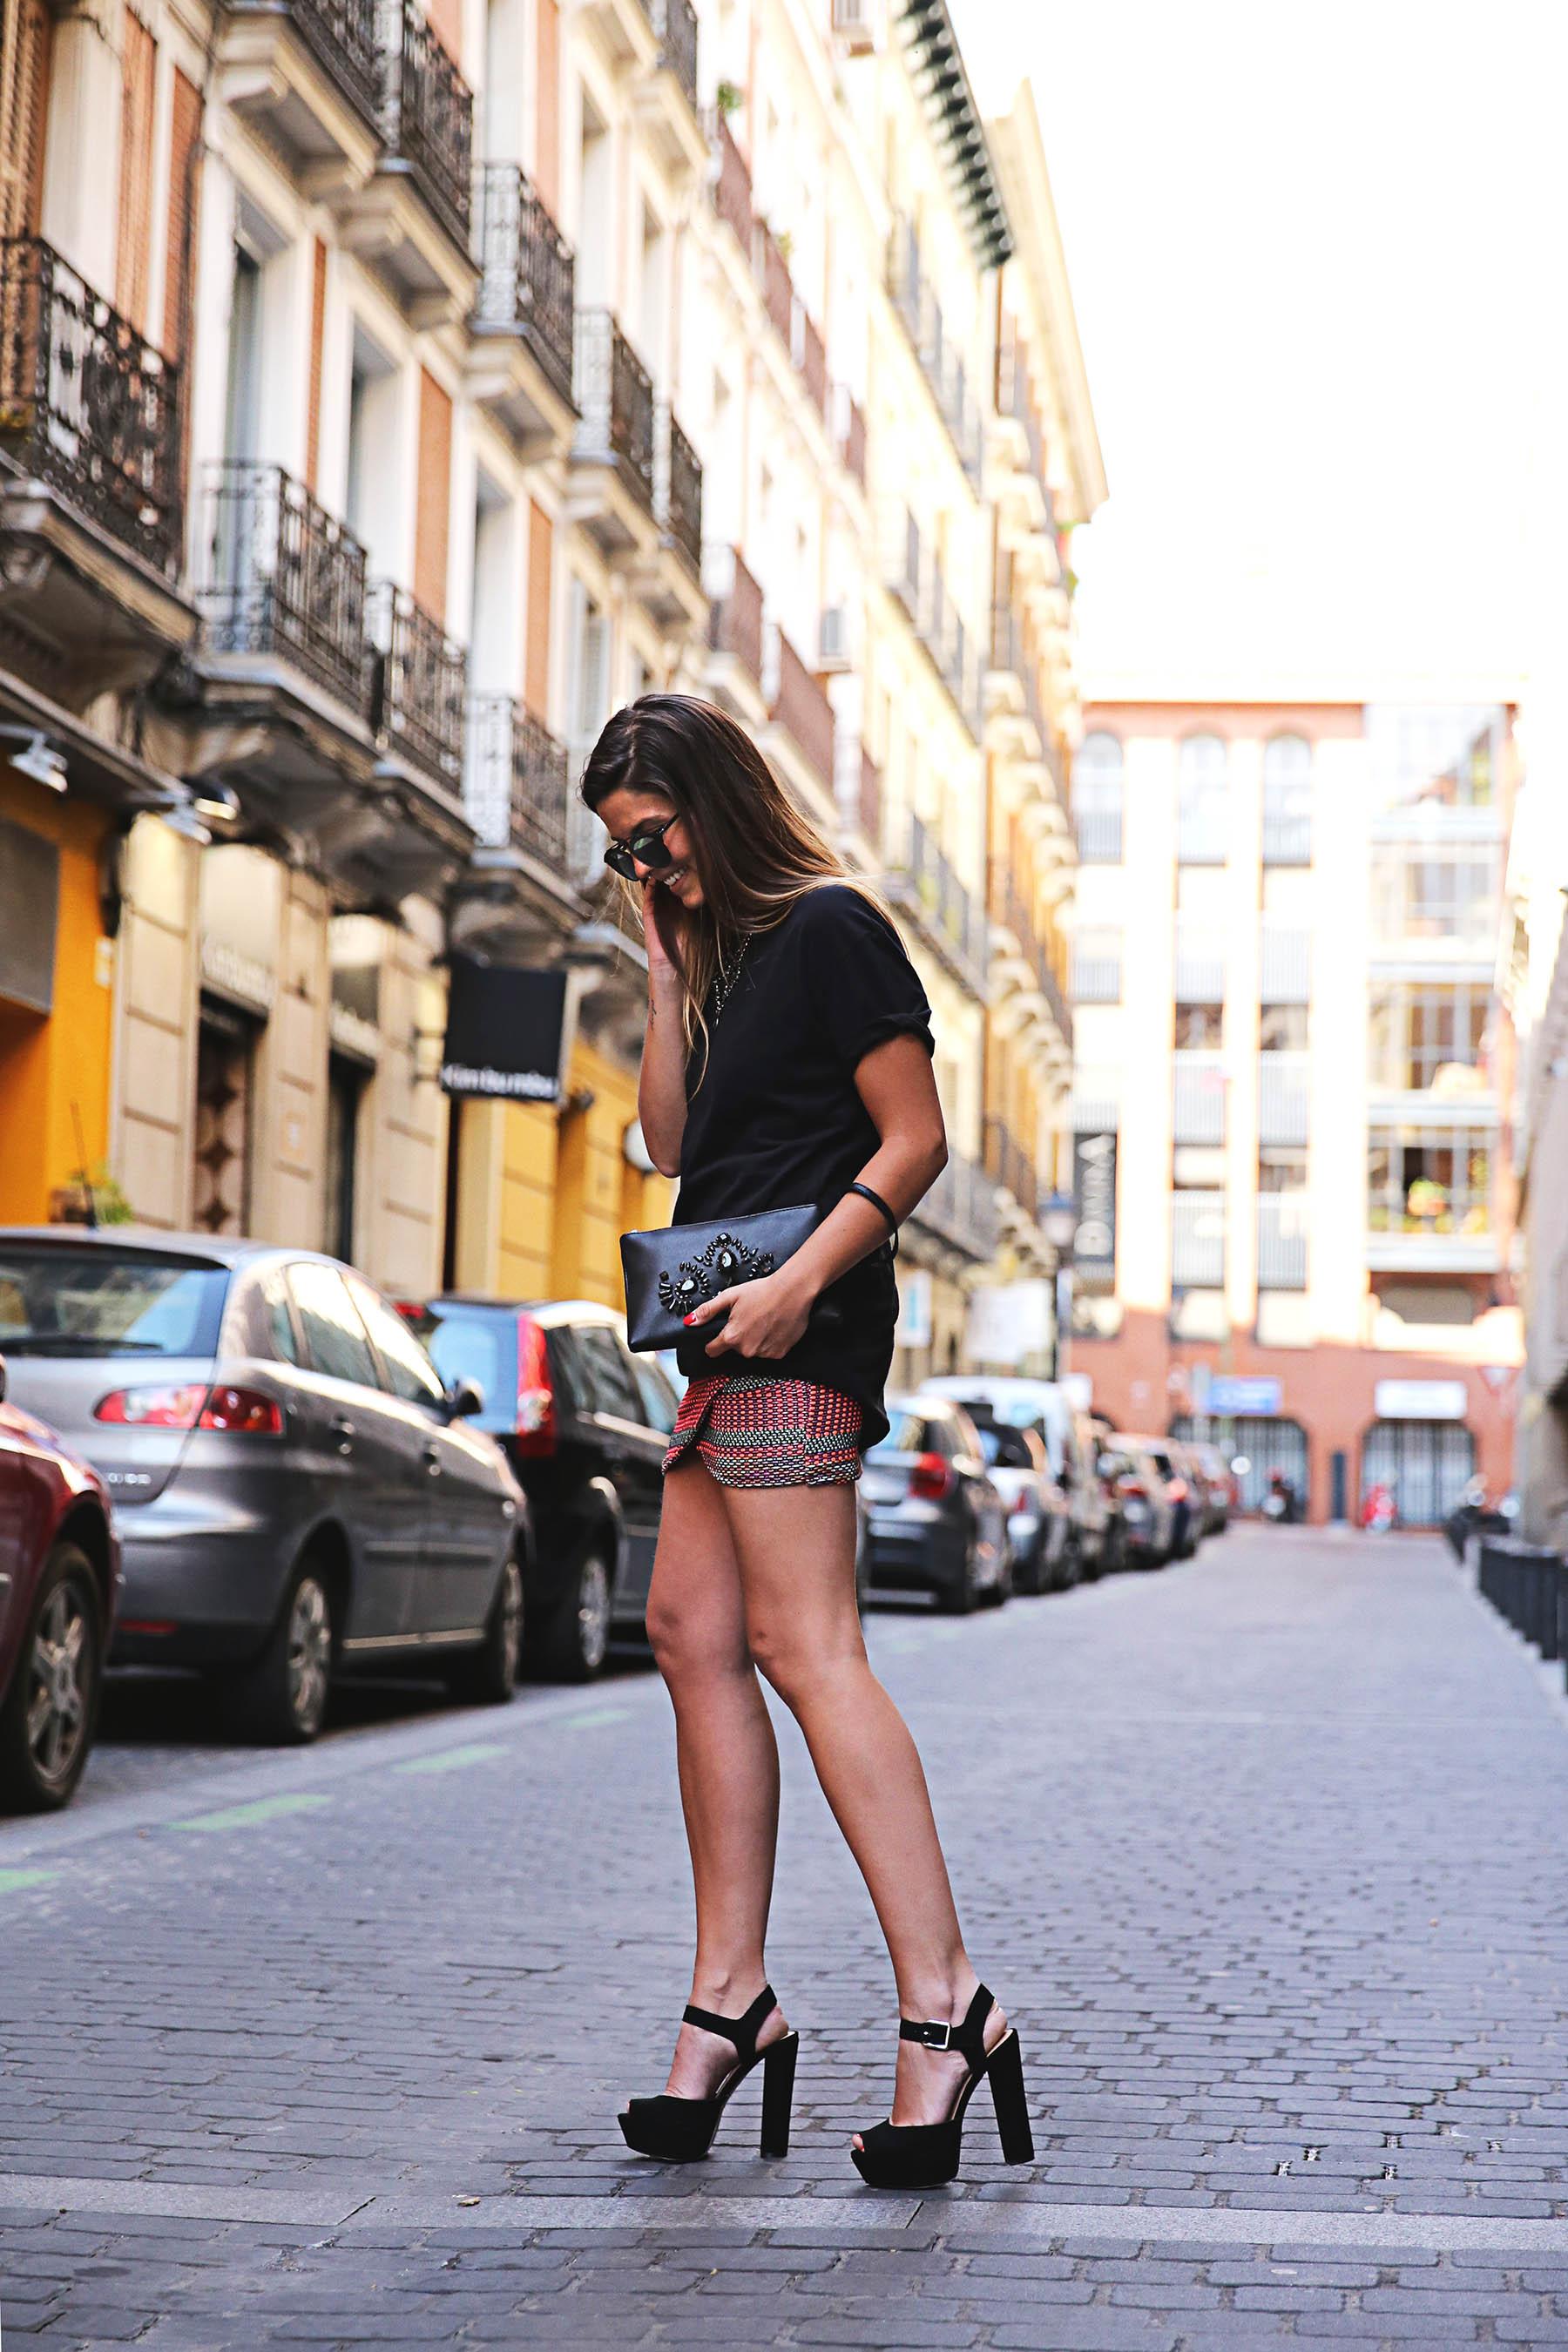 trendy-taste-look-outfit-street-style-ootd-blog-blogger-fashion-spain-moda-españa-falda-etnica-ethnic-print-skirt-steve-madden-basic-tee-dior-black-negro-9